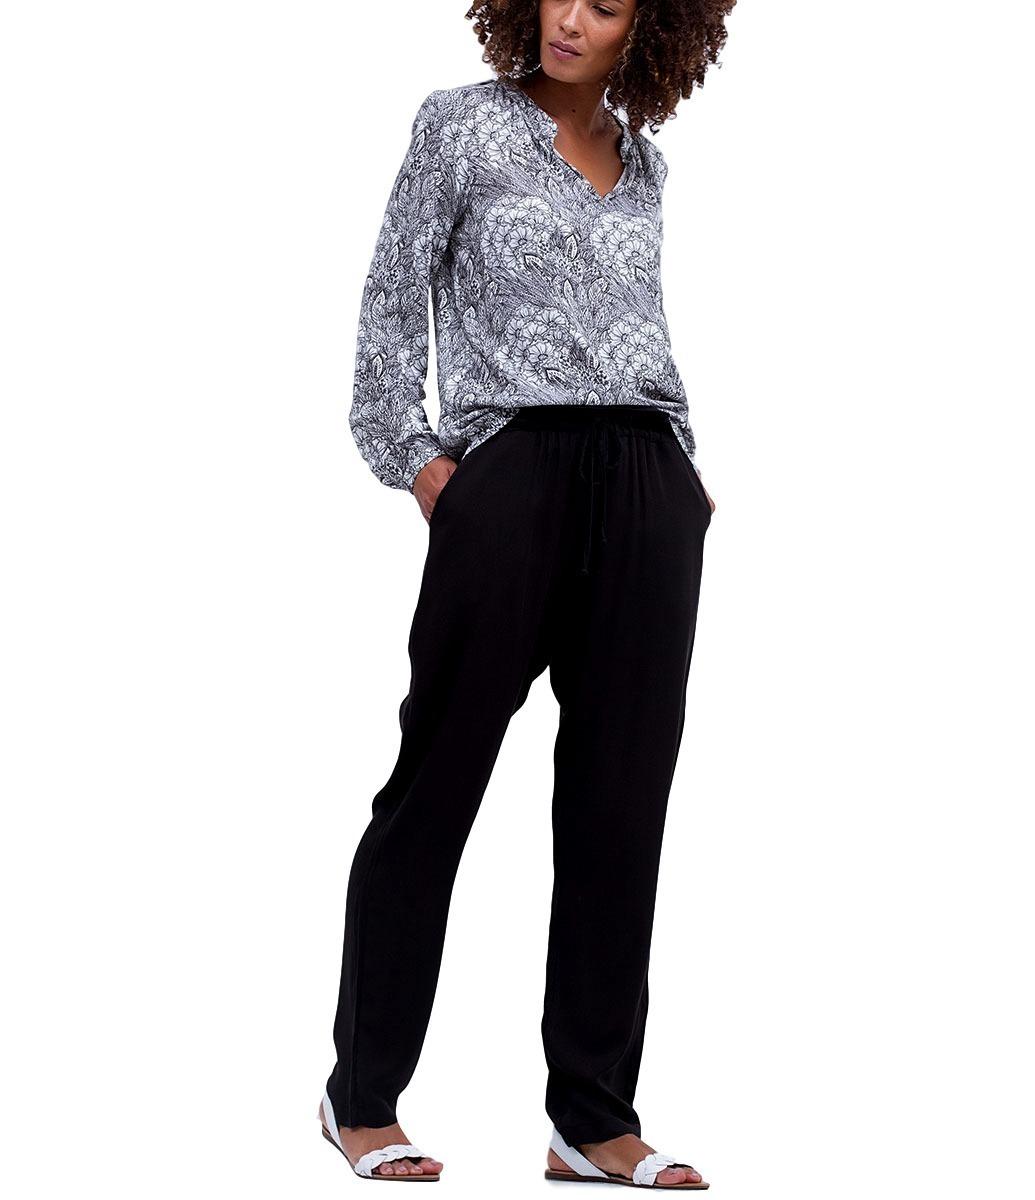 03601c0ecb8db1 Kit 2 Calça Jockey Feminina Tipo Pijama Exclusive Ref 102